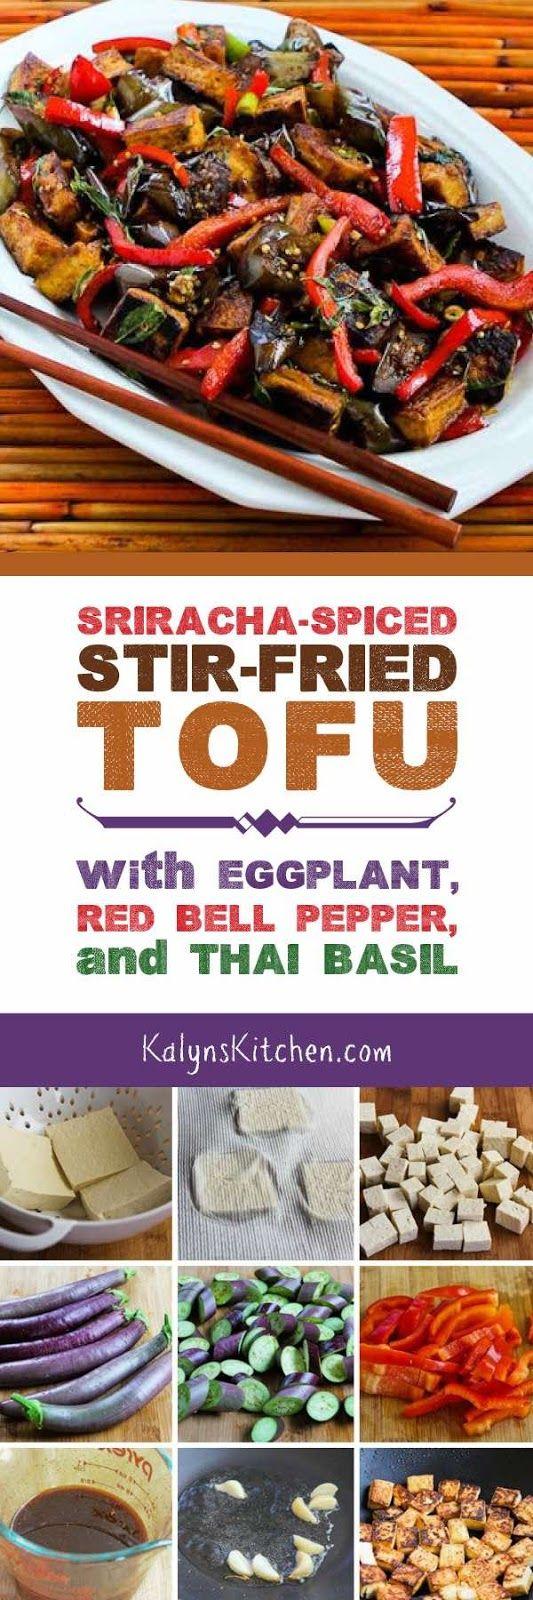 Best 25+ Thai vegetarian recipes ideas on Pinterest ...